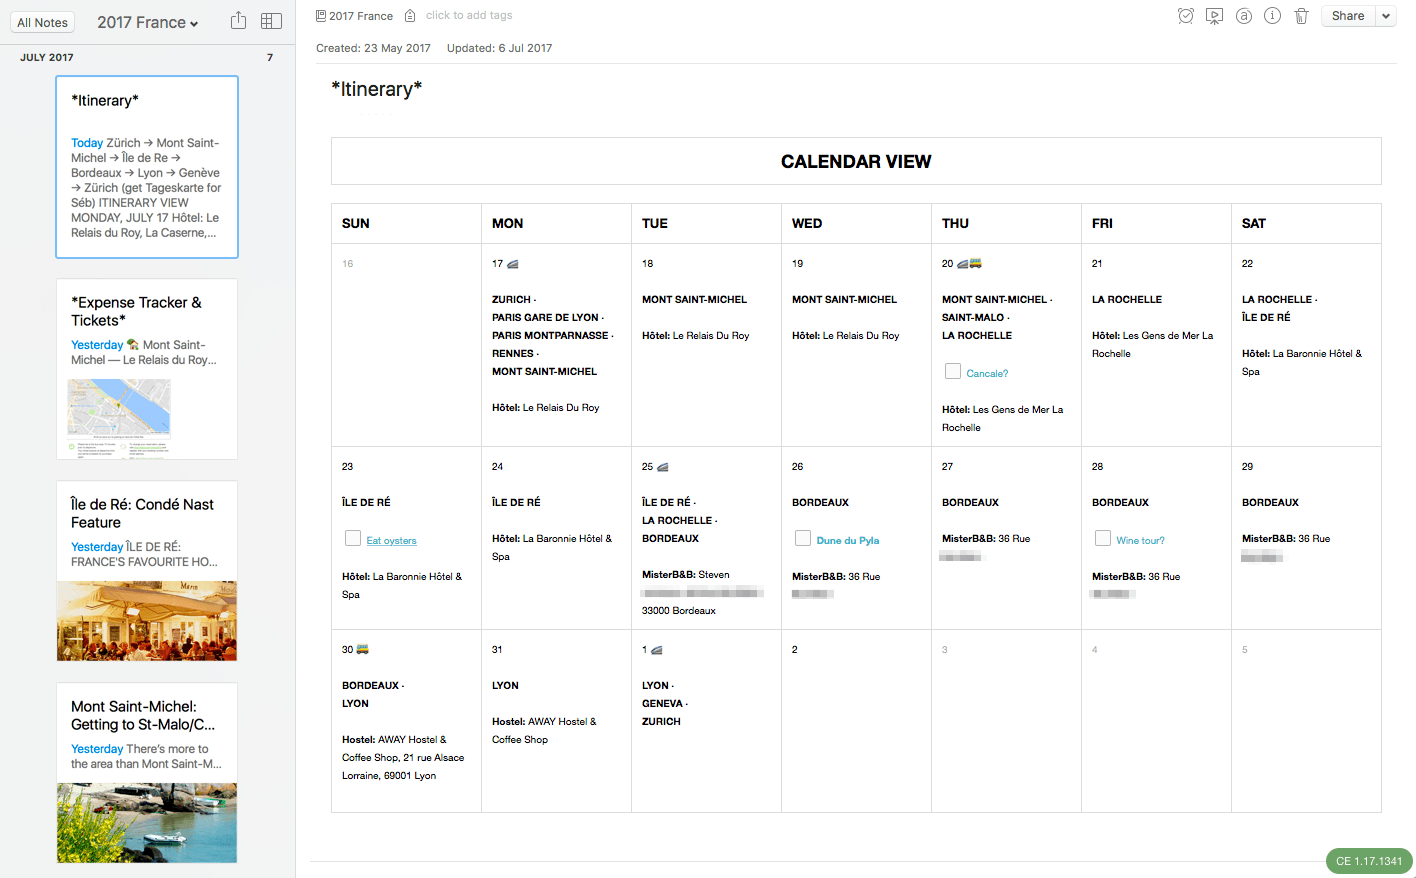 Calendario con fechas de viaje